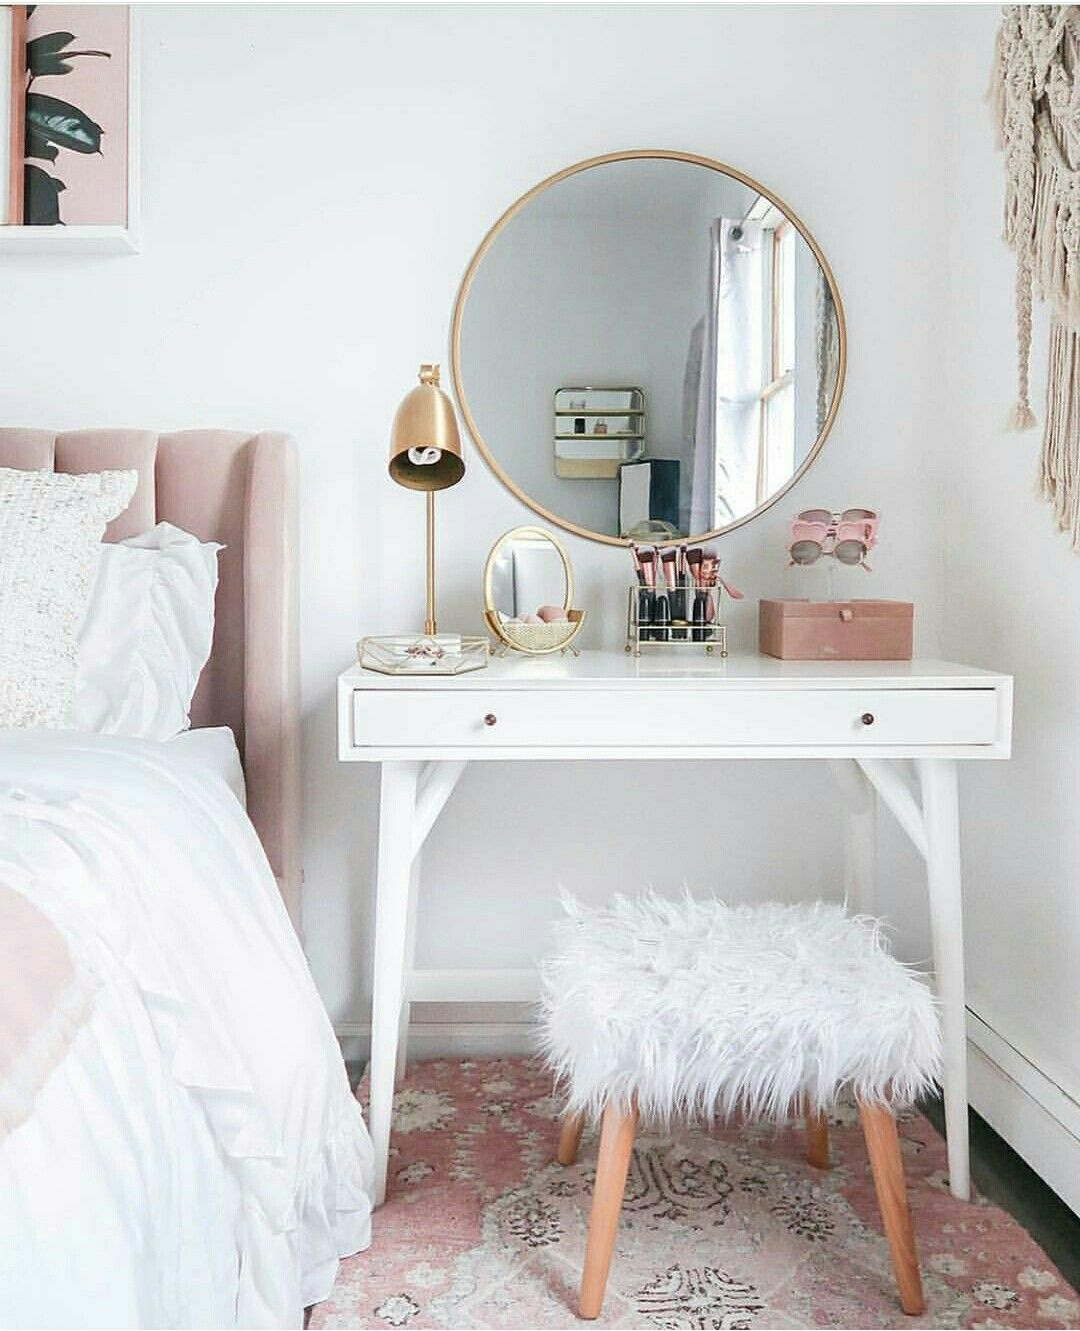 Pin By Rida On Decoracao Para Quartos Small Bedroom Vanity Home Decor Room Inspiration